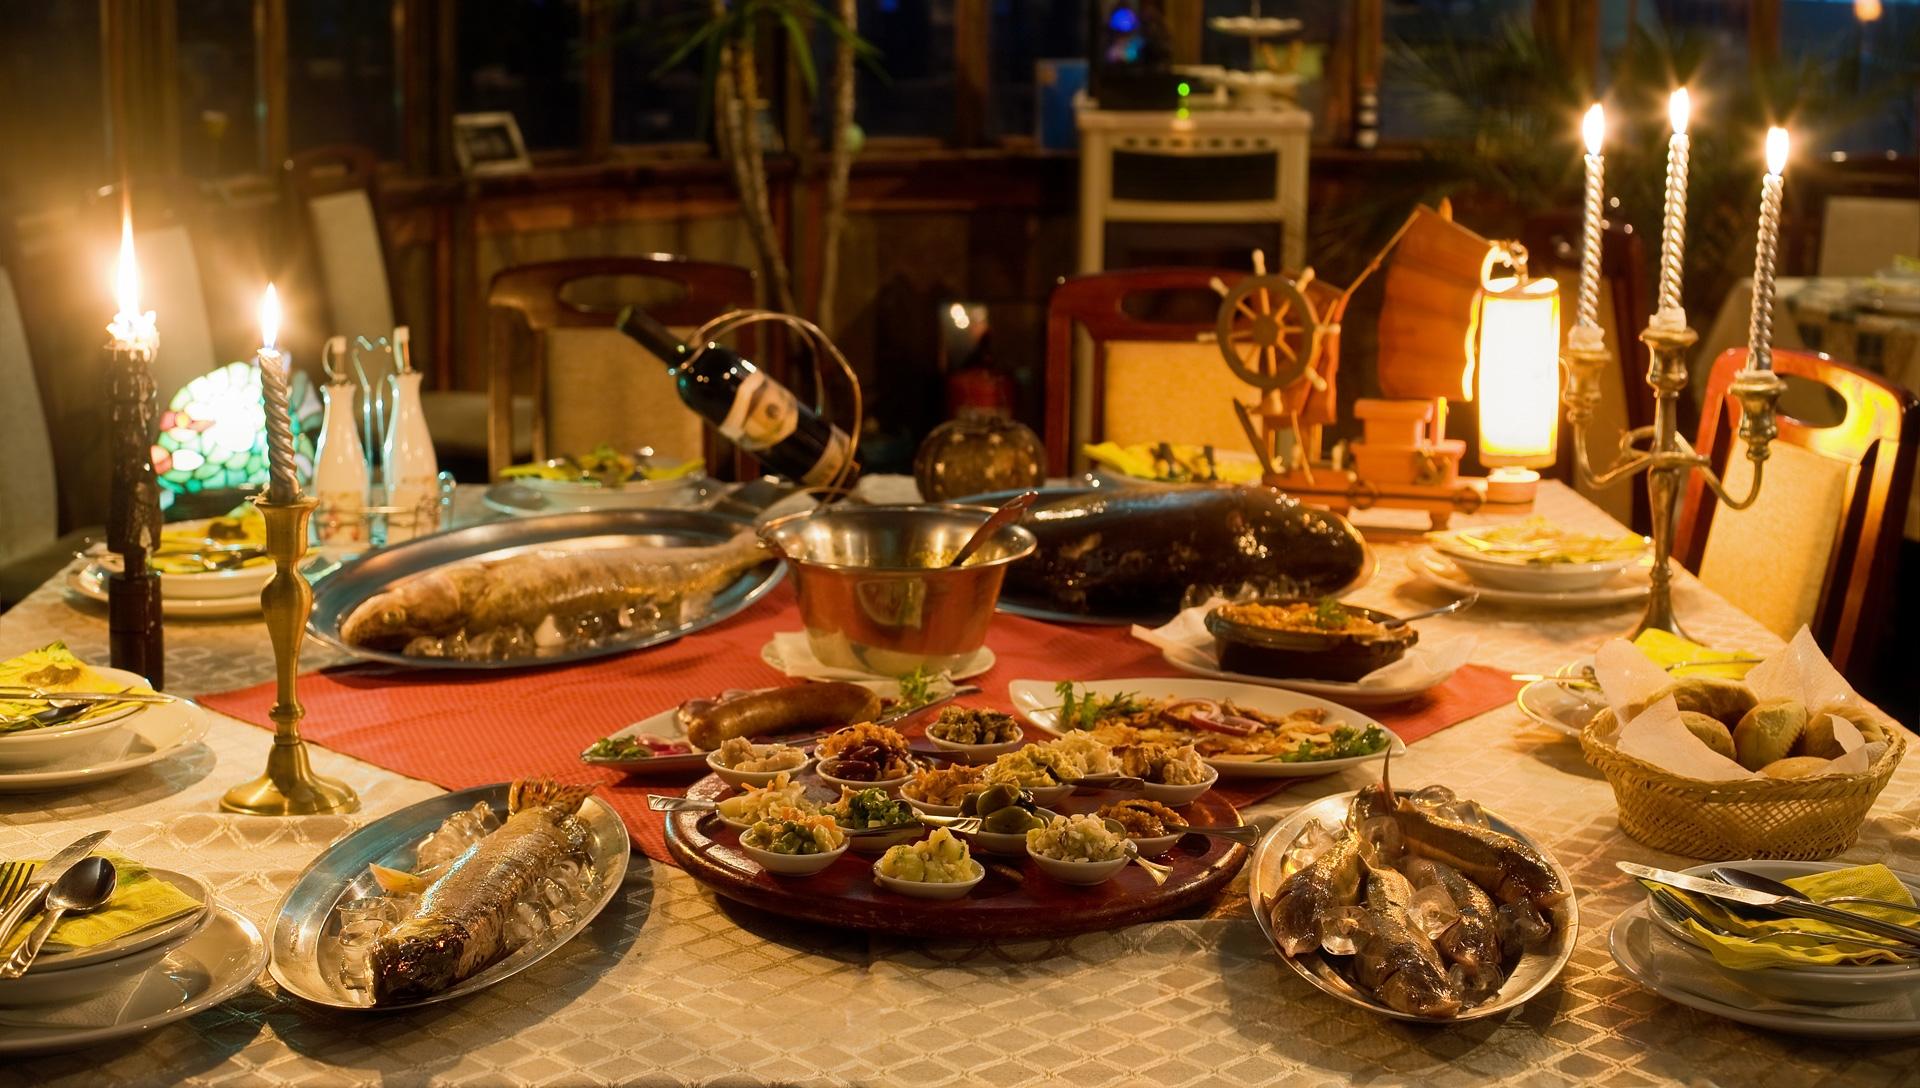 Restoran Ribnjak Meze na stolu